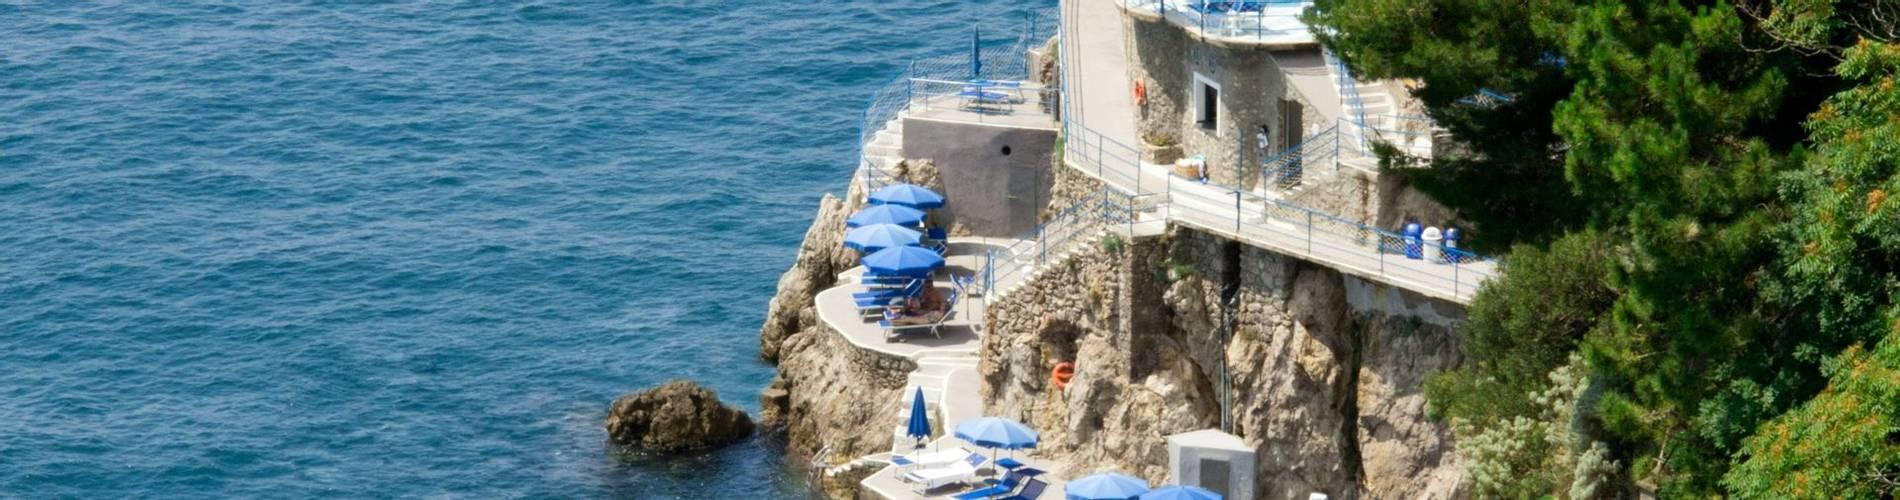 Miramalfi, Amalfi Coast, Italy (35).jpg